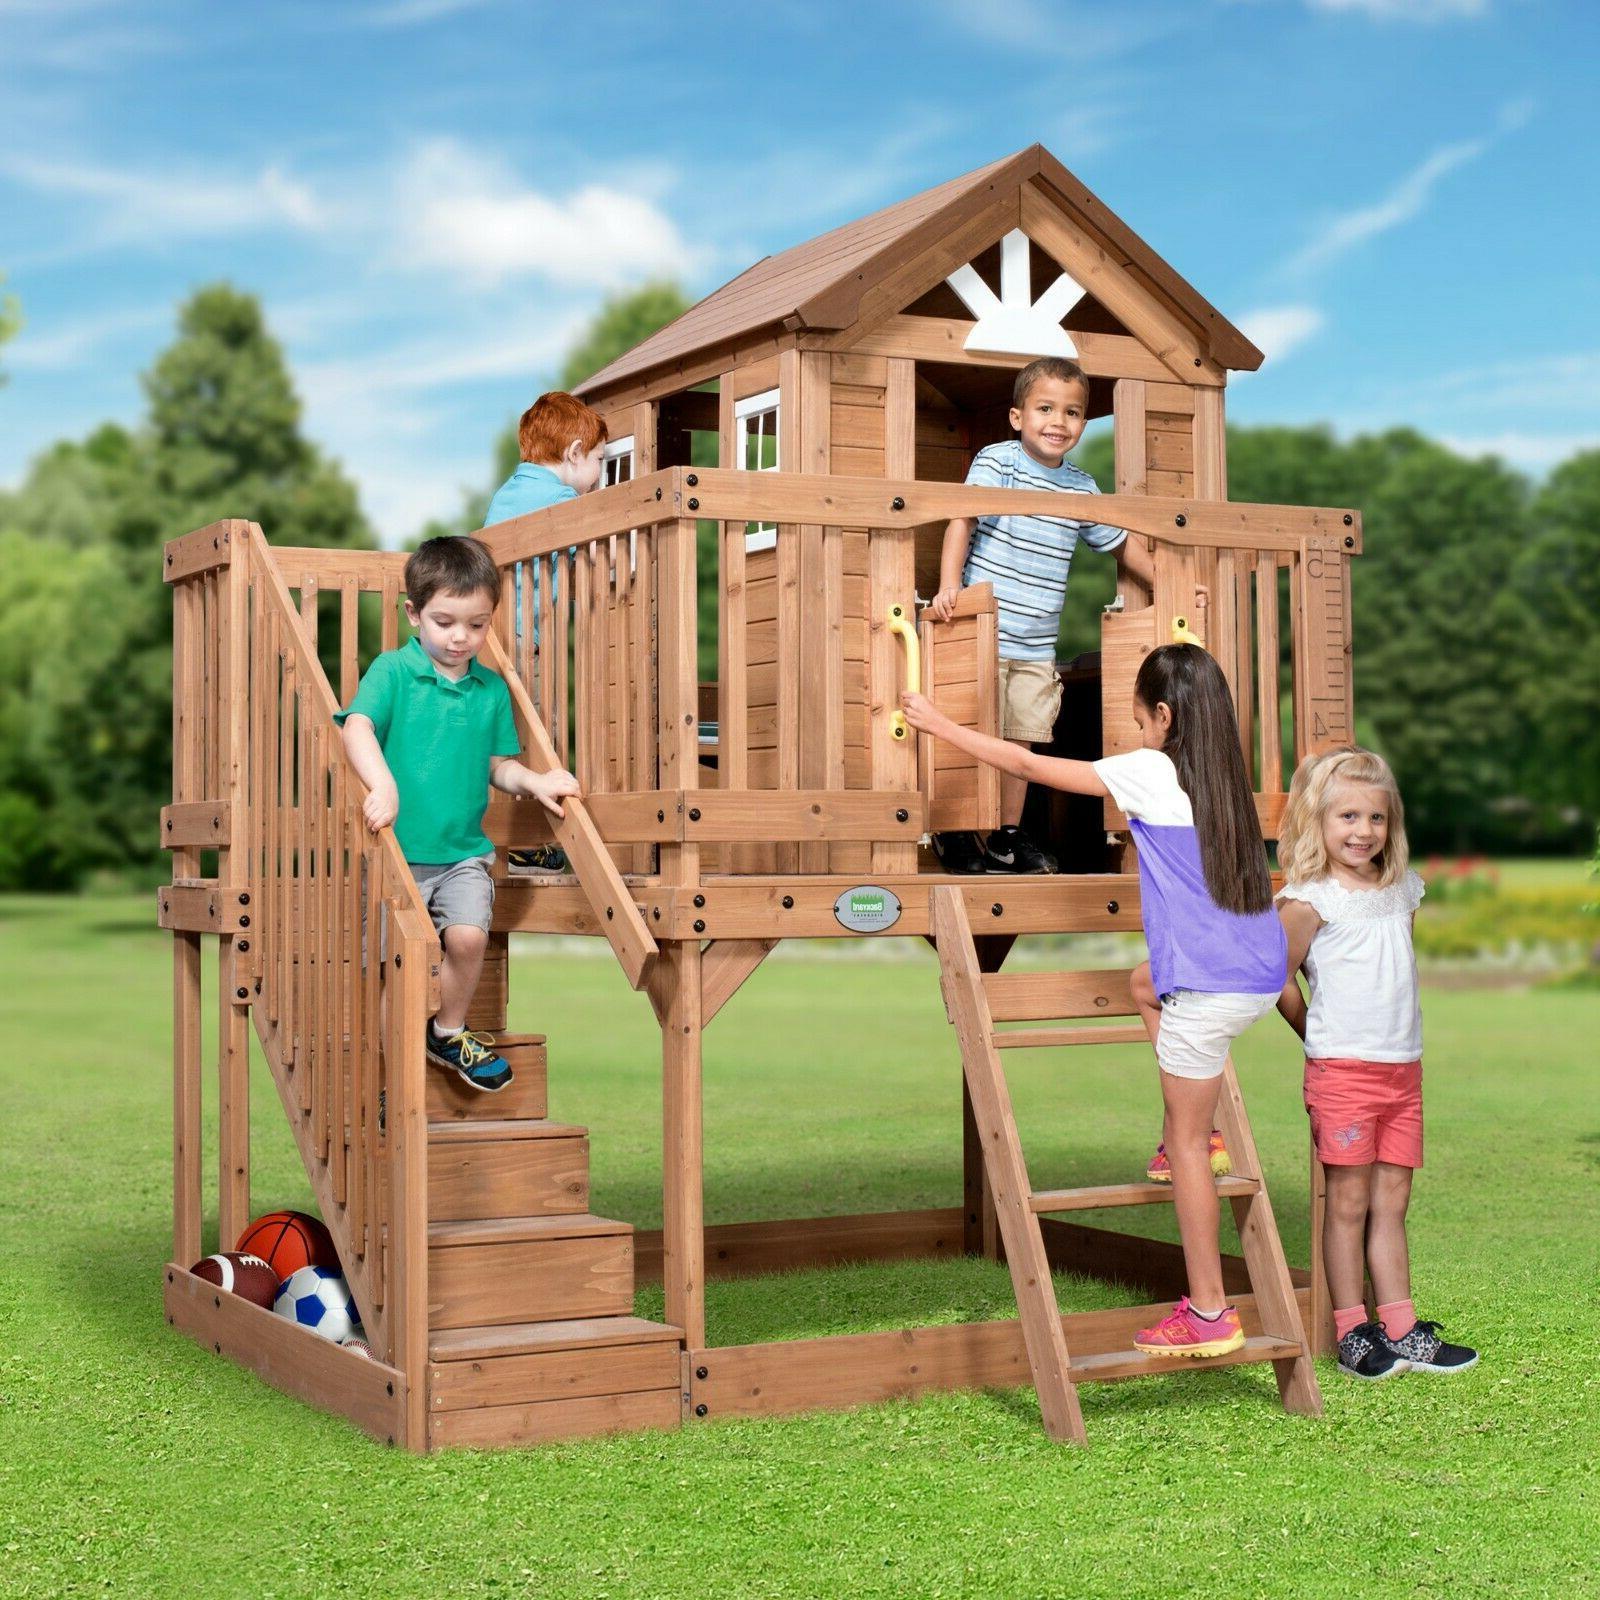 Outdoor Kids Cedar Playhouse w/ Stairs Backyard BIG Cottage